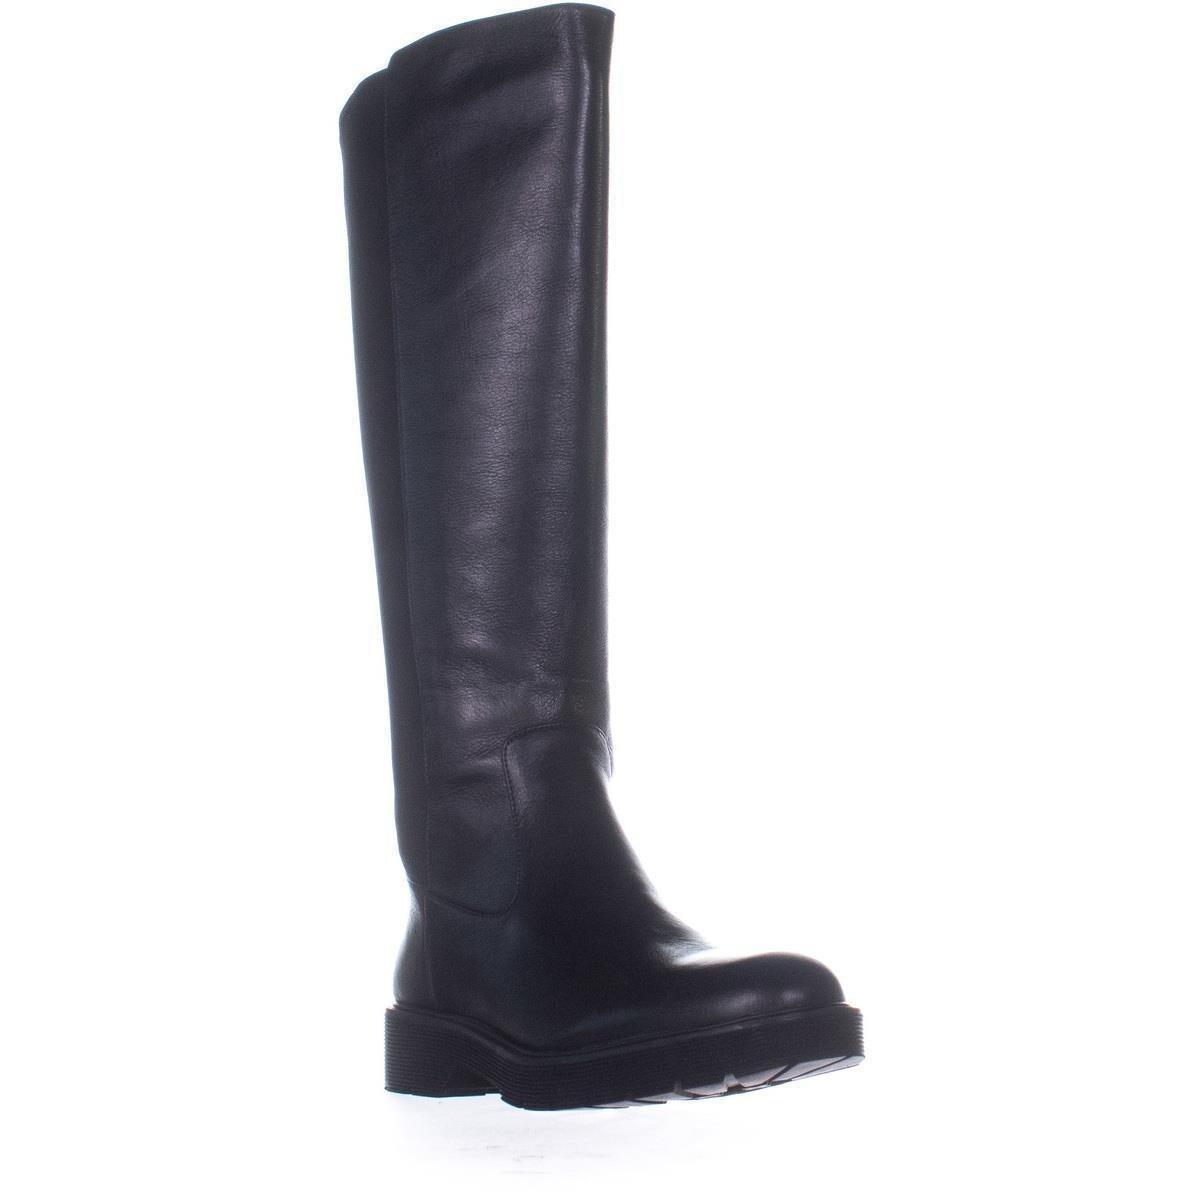 e40c561ccb4 Buy Medium Calvin Klein Women s Boots Online at Overstock